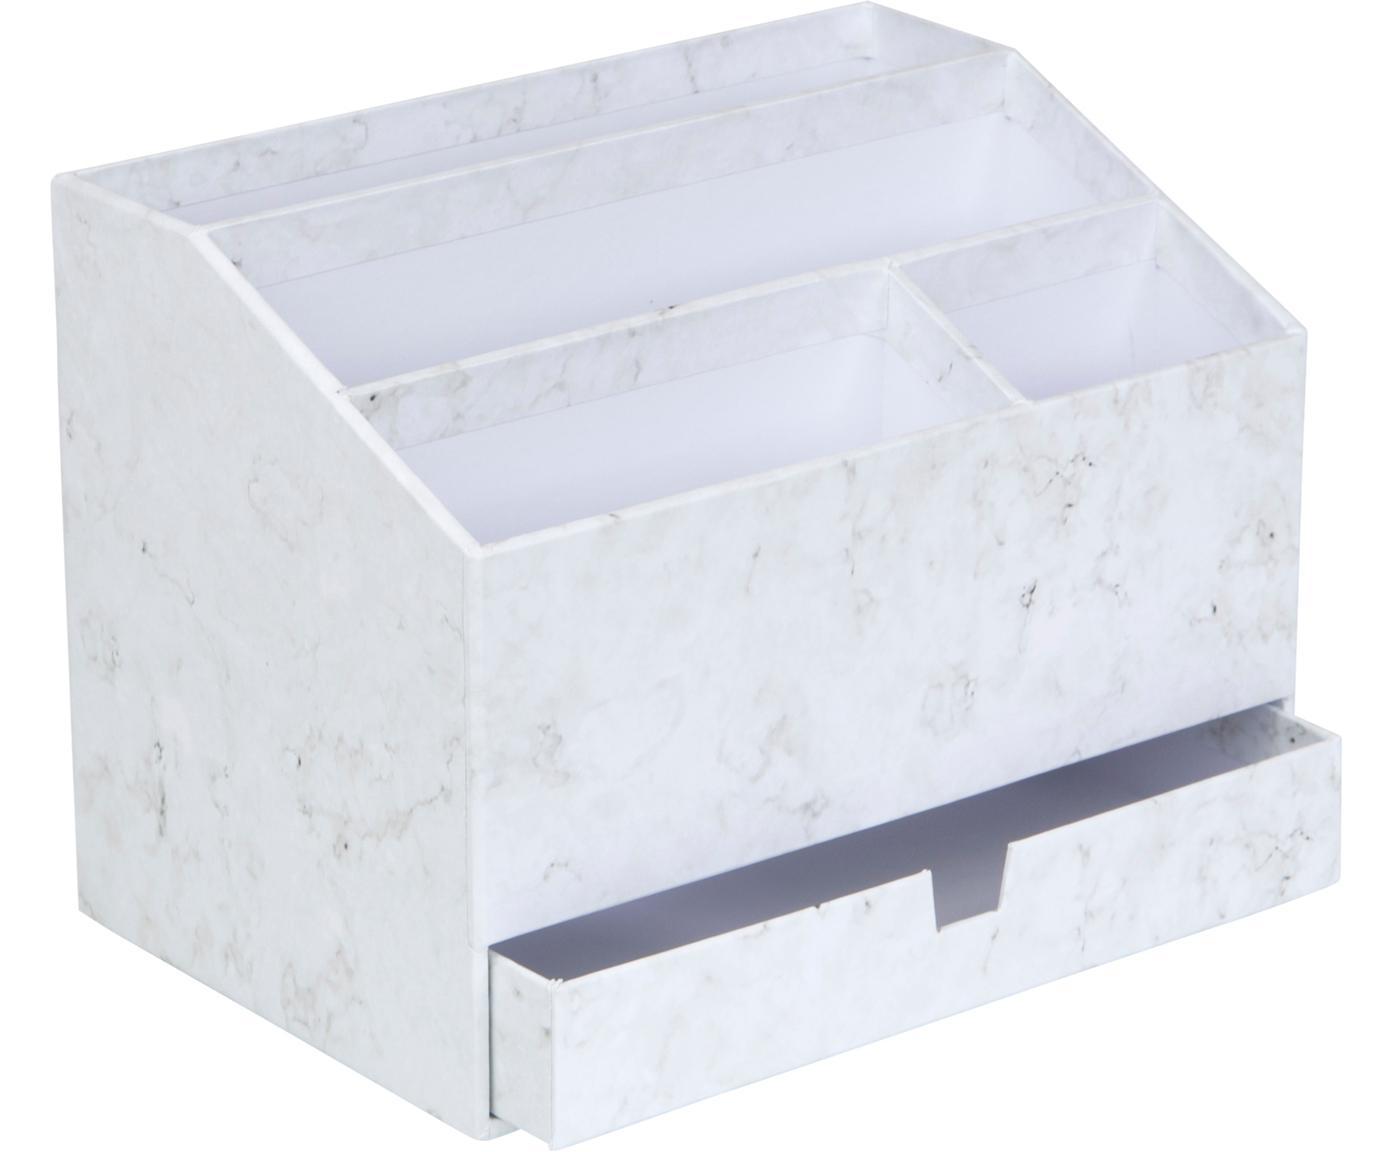 Bureau organizer Greta, Massief, gelamineerd karton, Gemarmerd wit, 24 x 18 cm